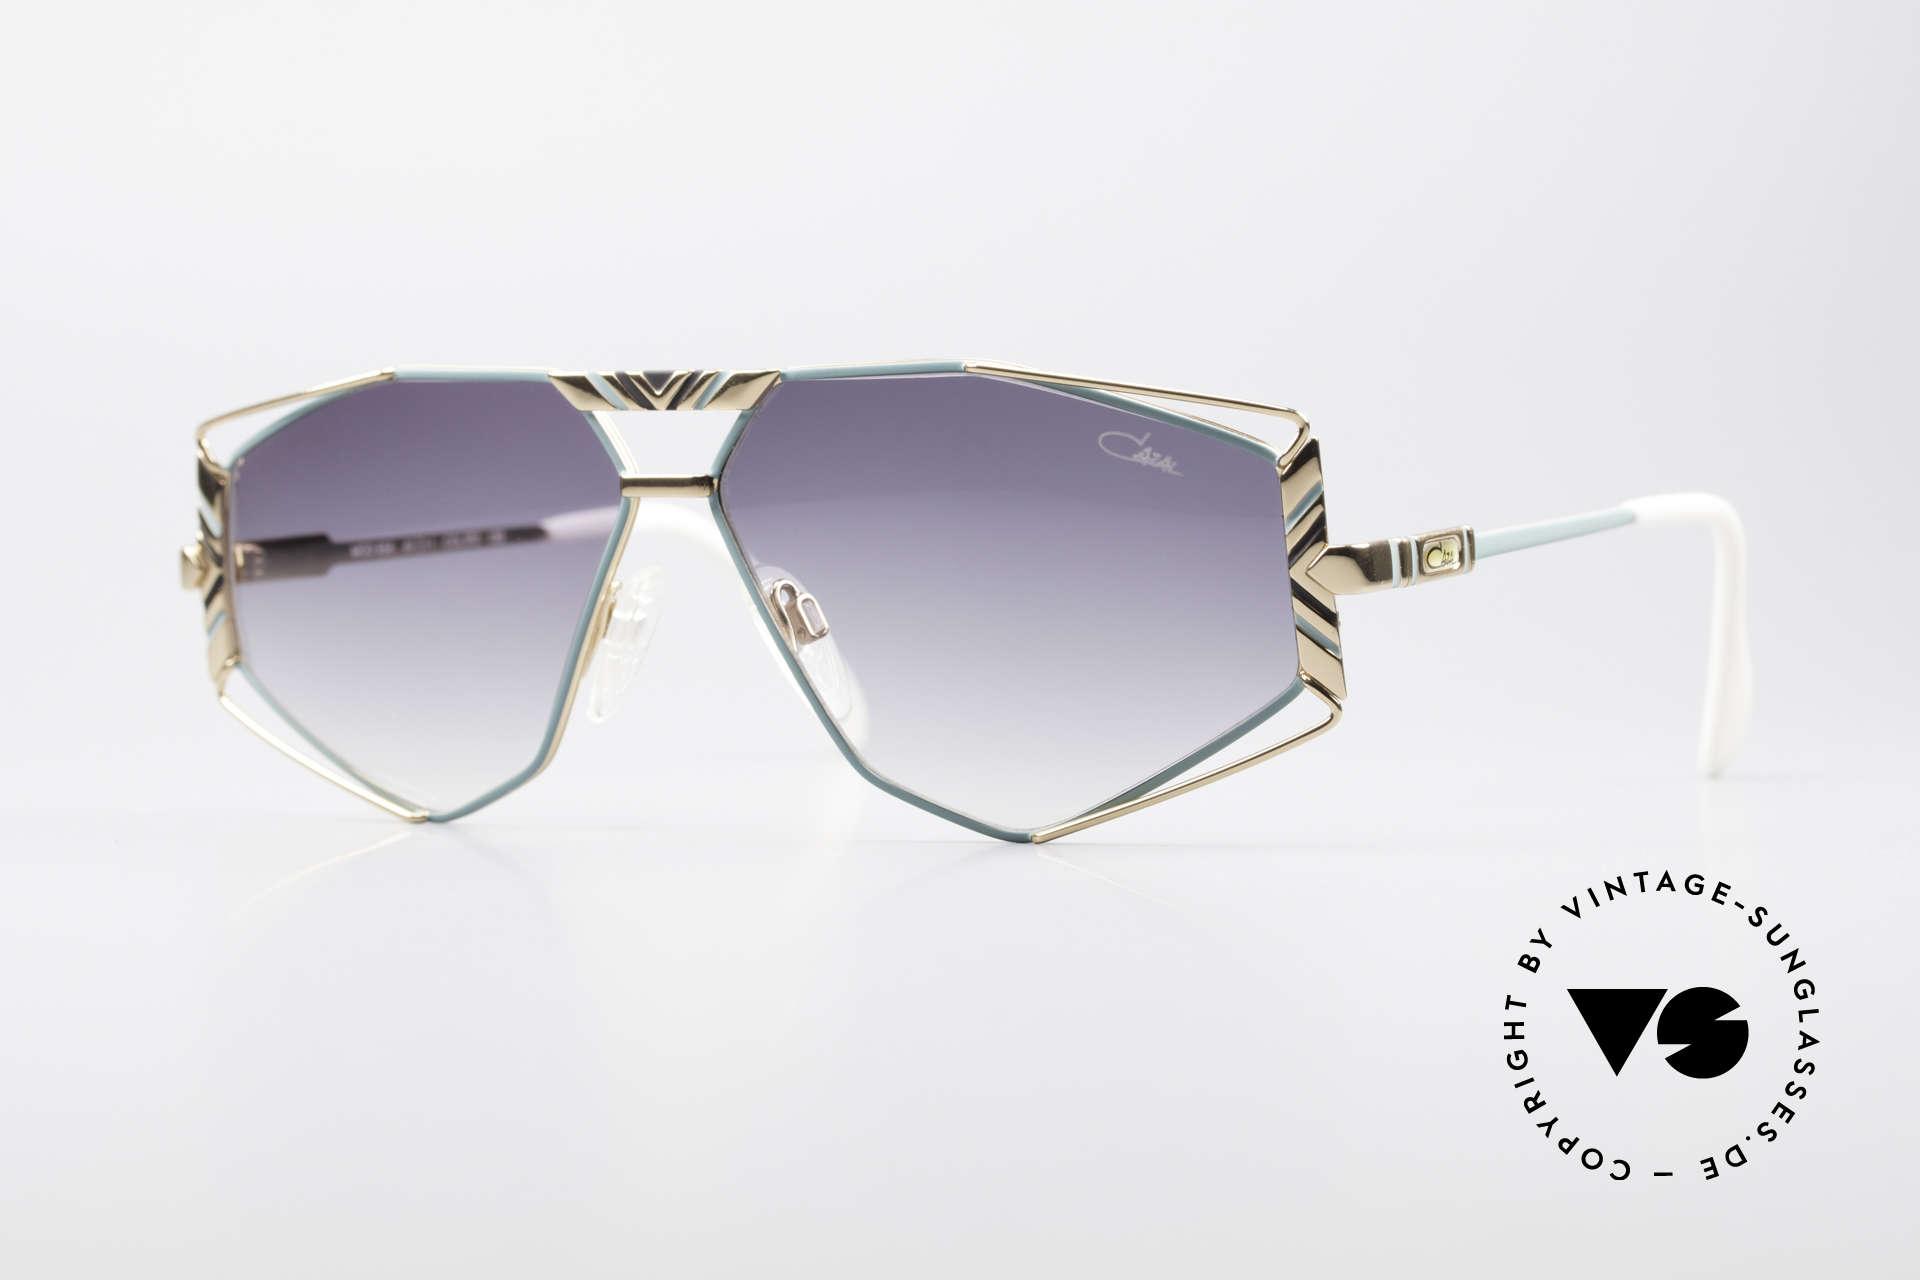 Cazal 956 Cari Zalloni Vintage Shades, artistic Cazal designer sunglasses from 1989/90, Made for Men and Women